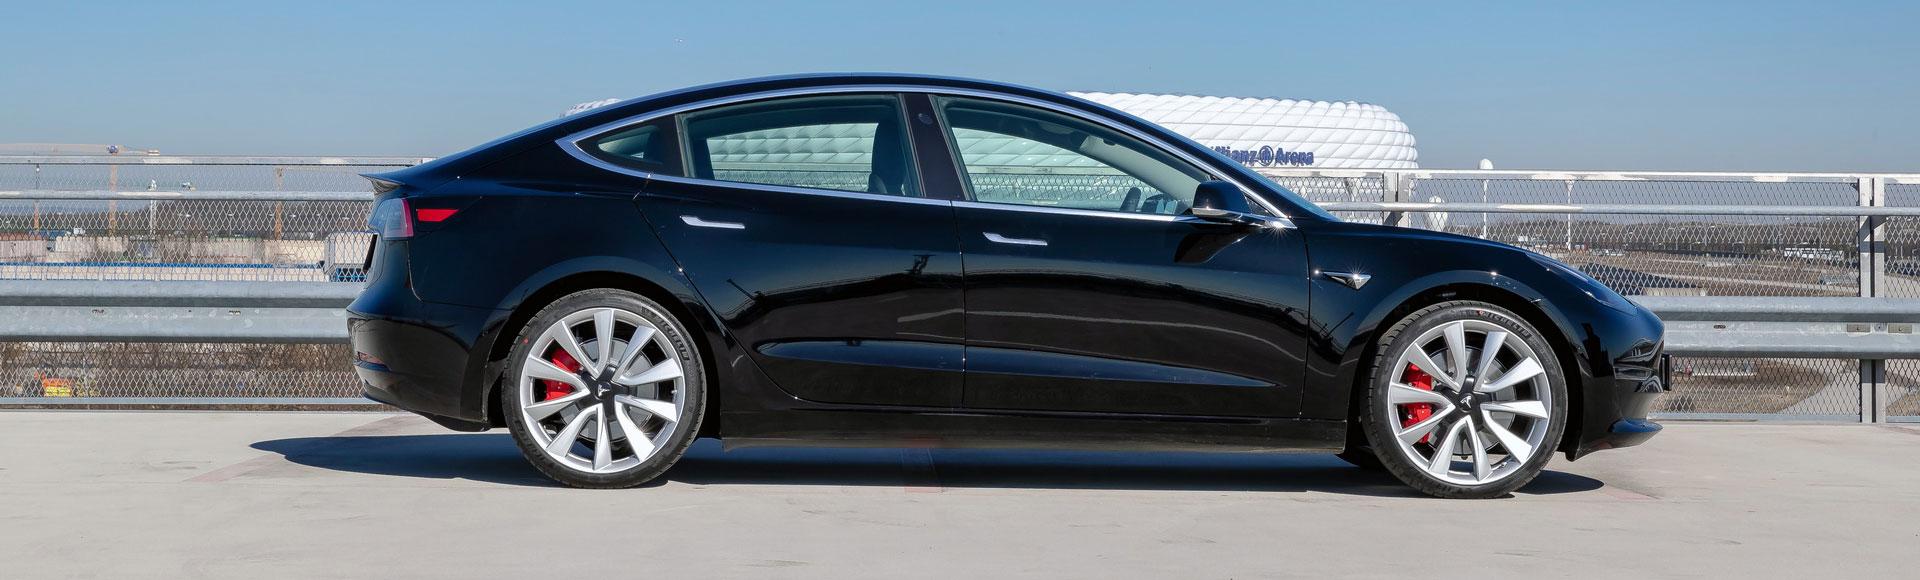 Tesla Model 3 2019 018